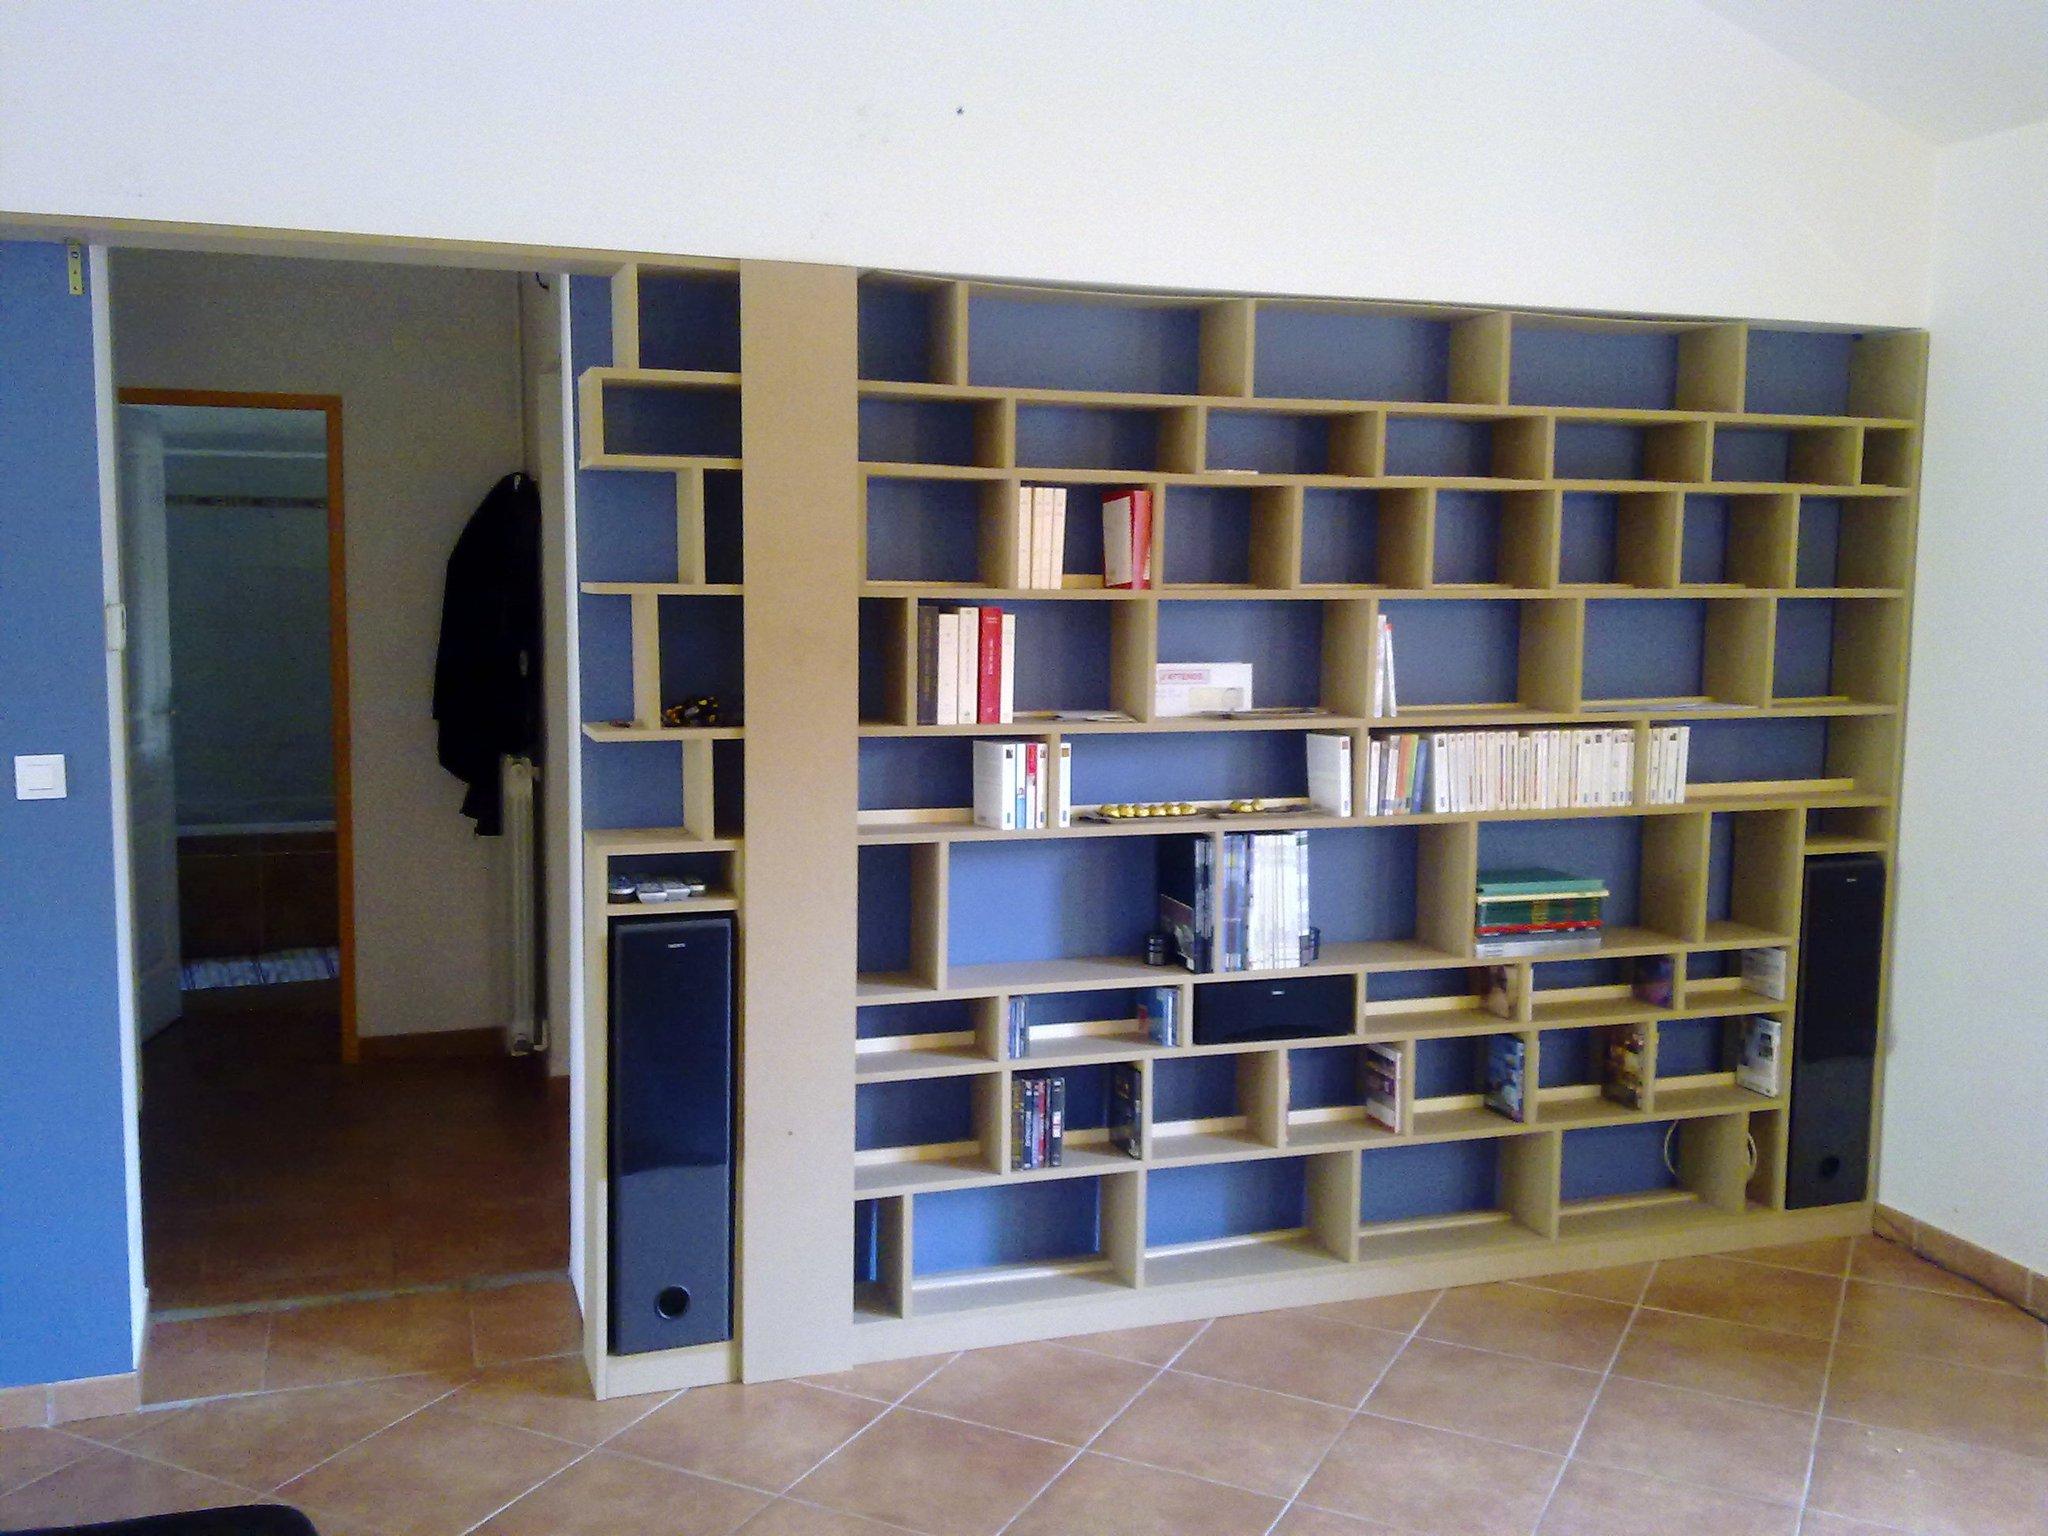 Construire Sa Bibliotheque Sur Mesure Construction De Notre Maison Rt2012